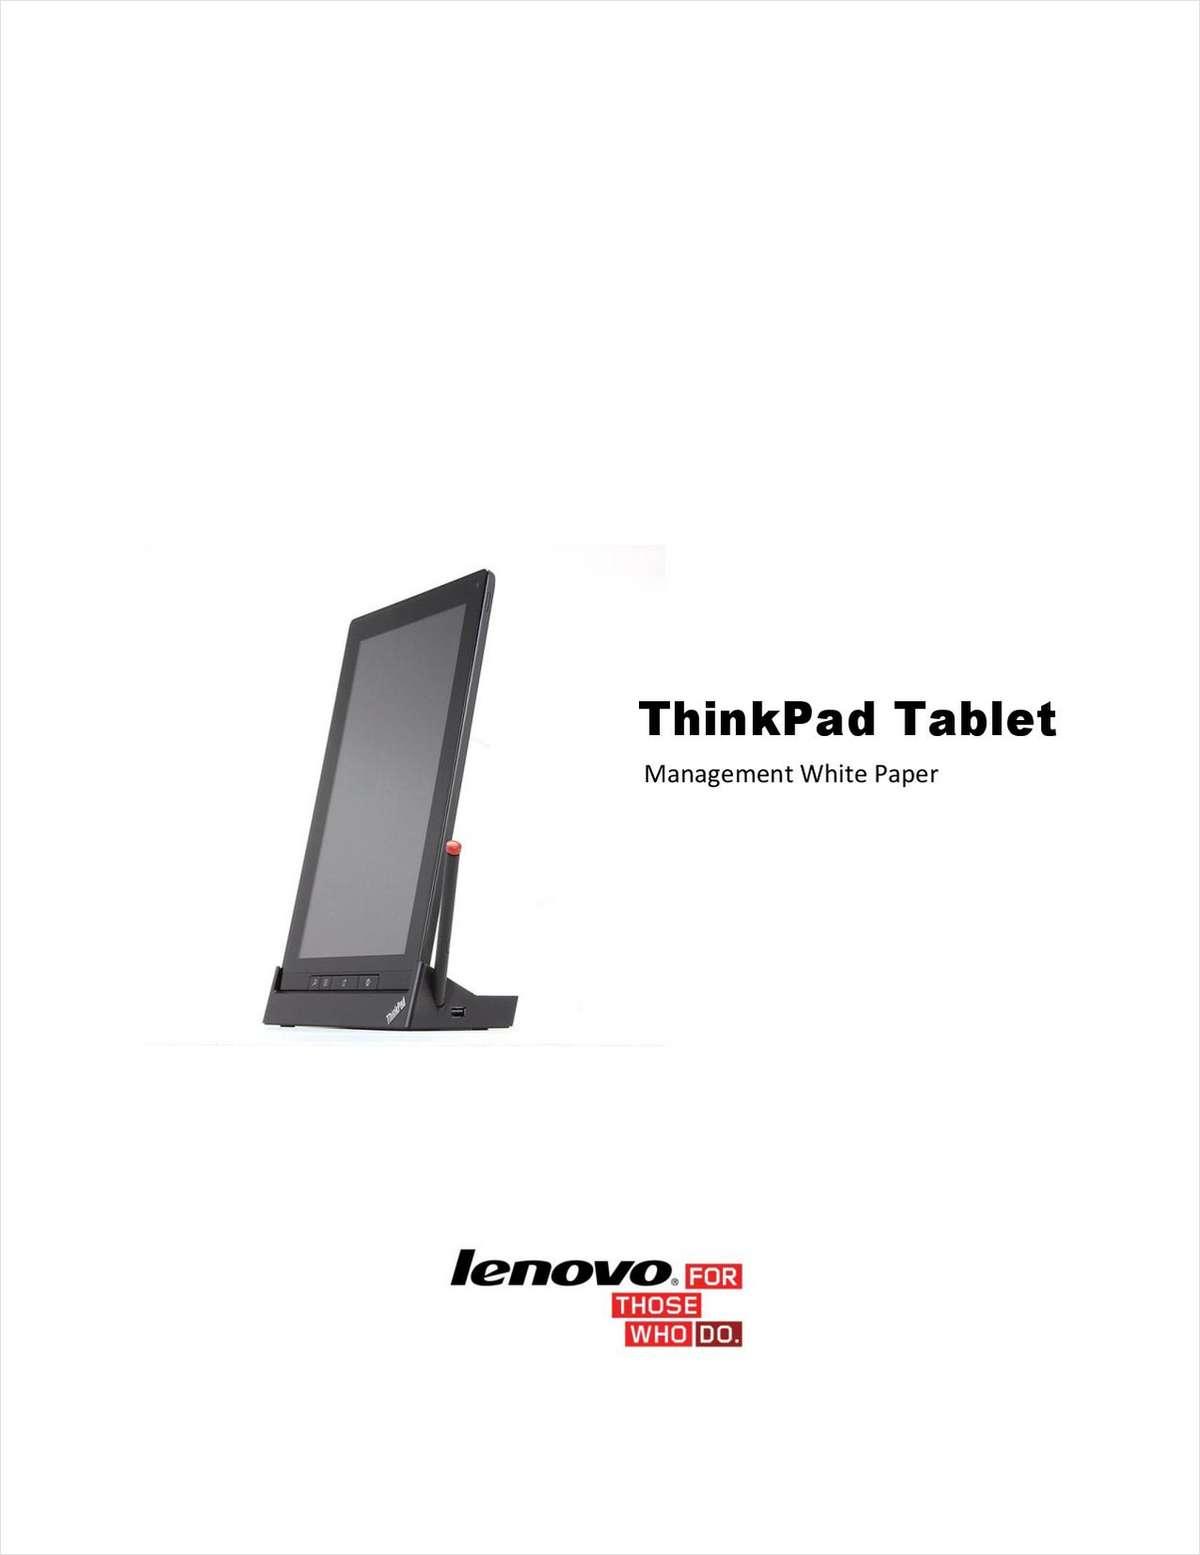 ThinkPad Tablet Management